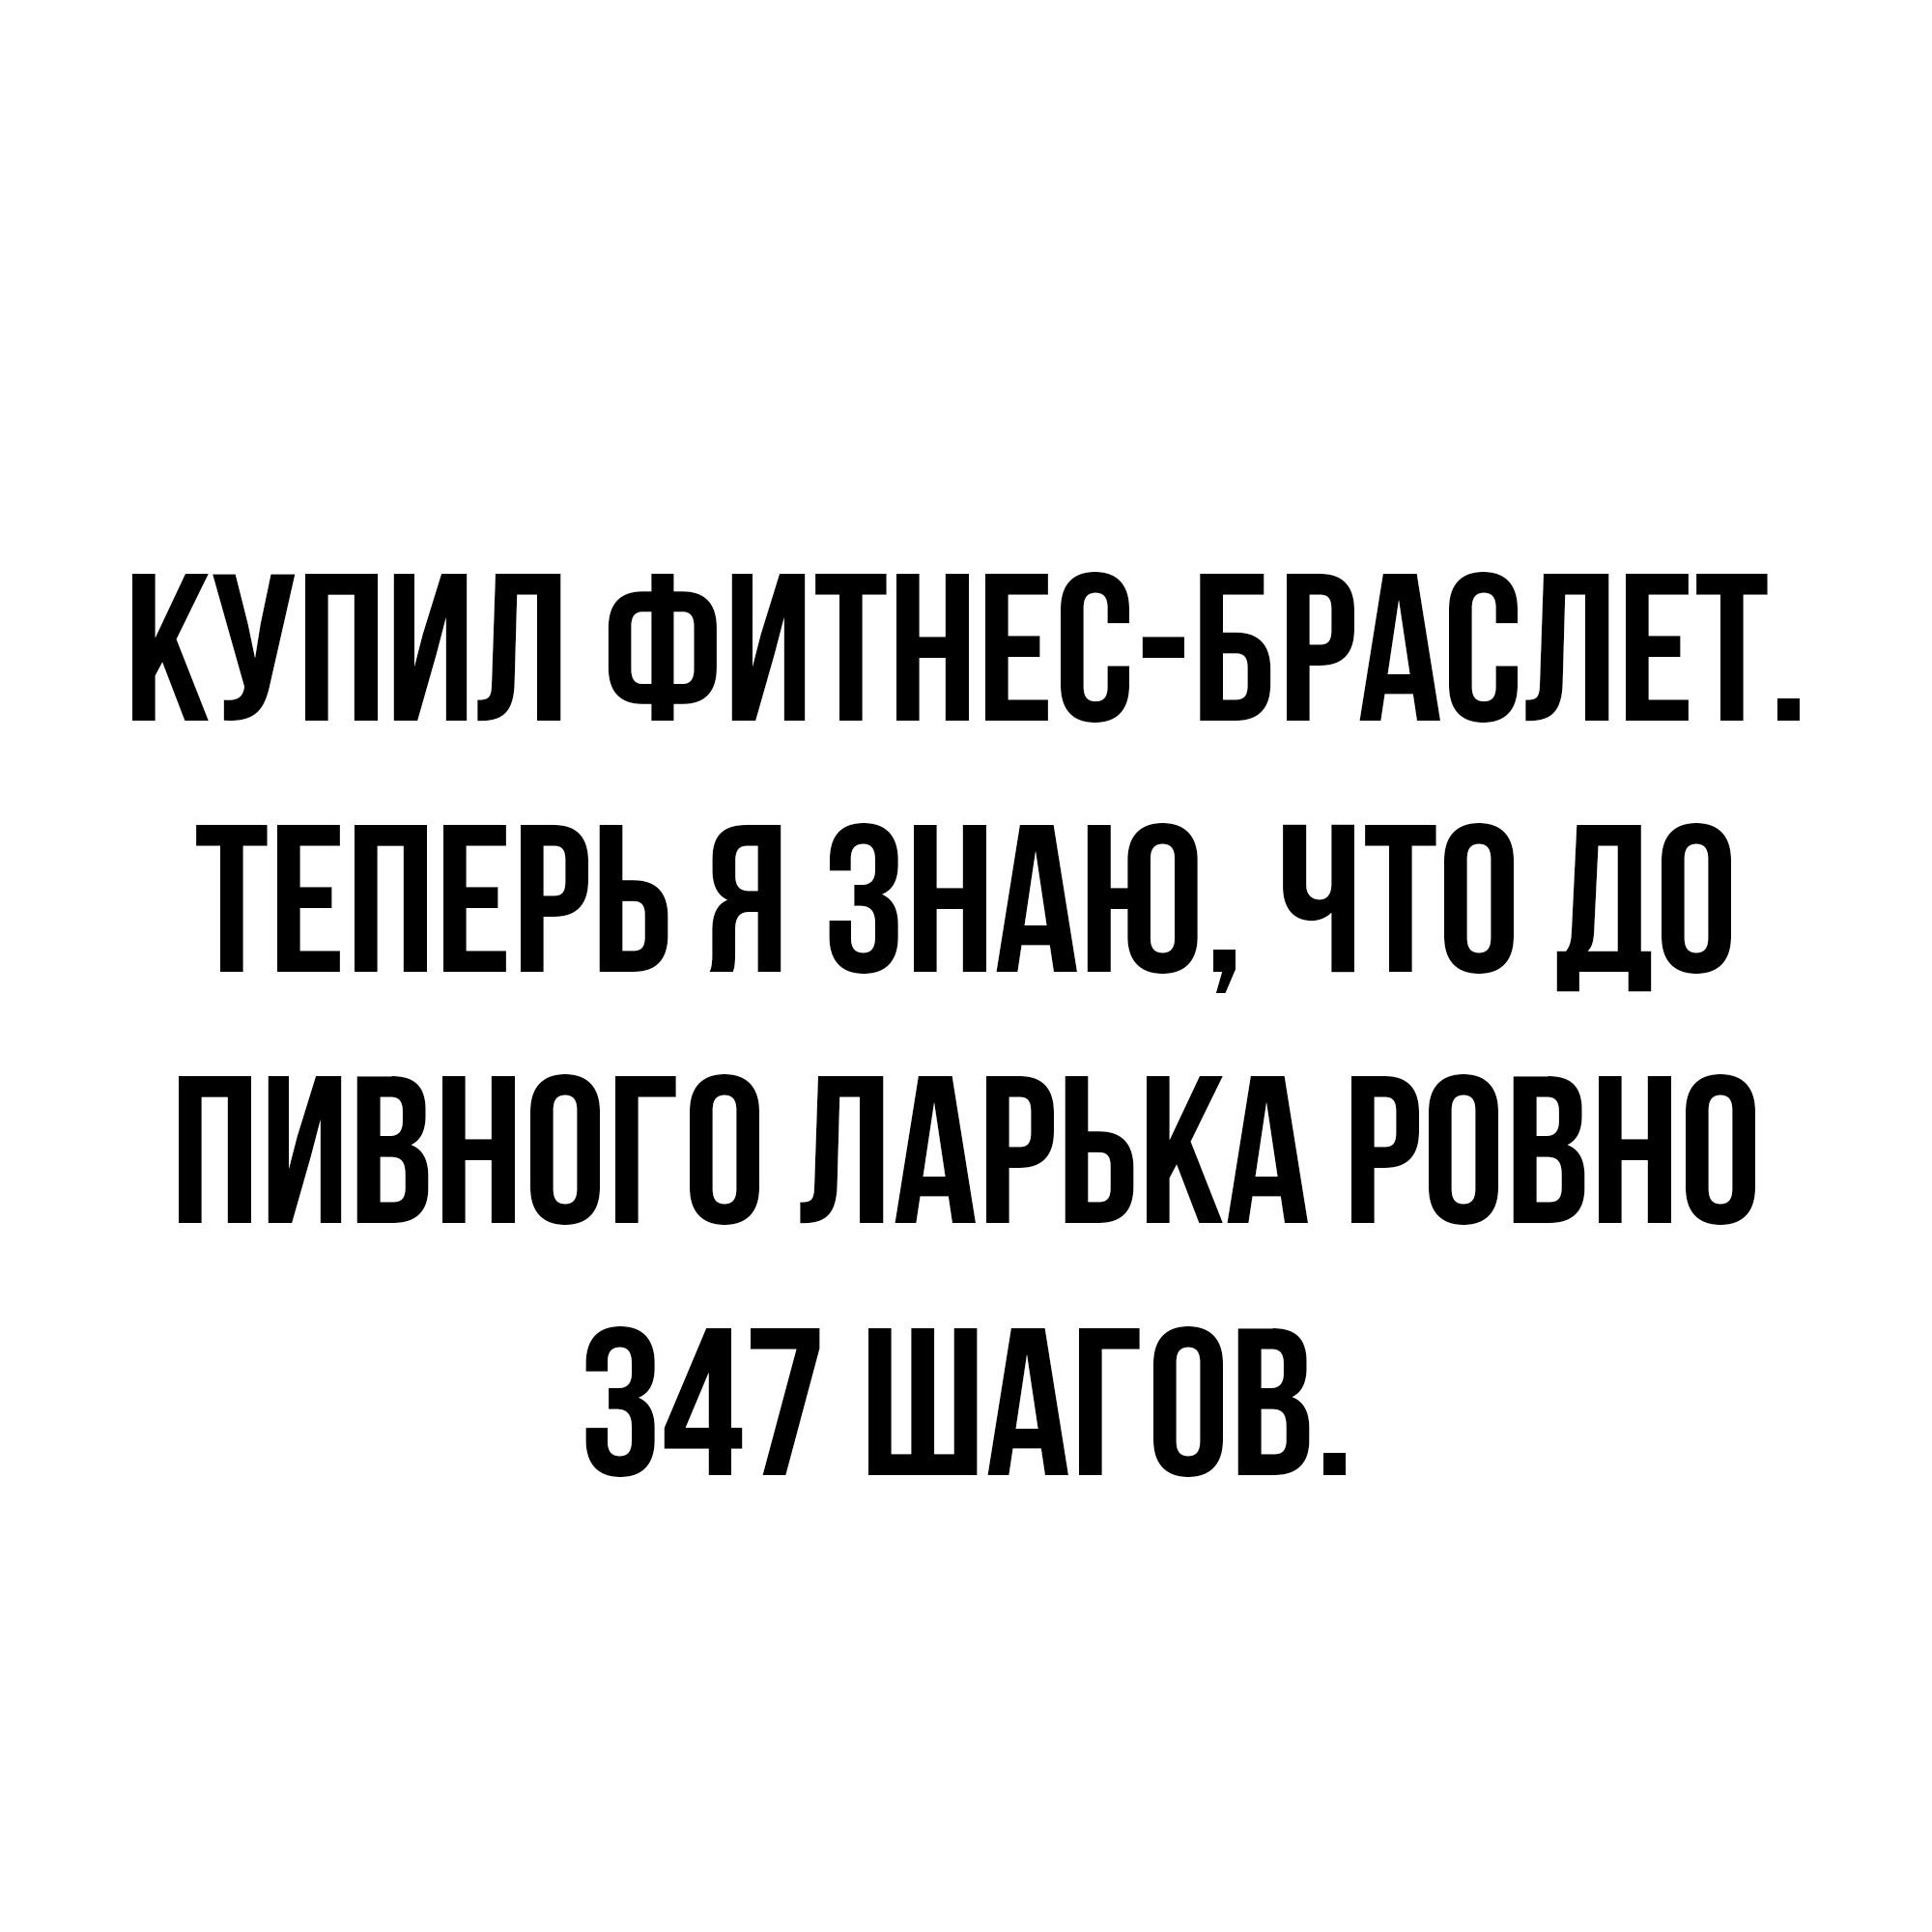 _N9nUYLSHpA.jpg